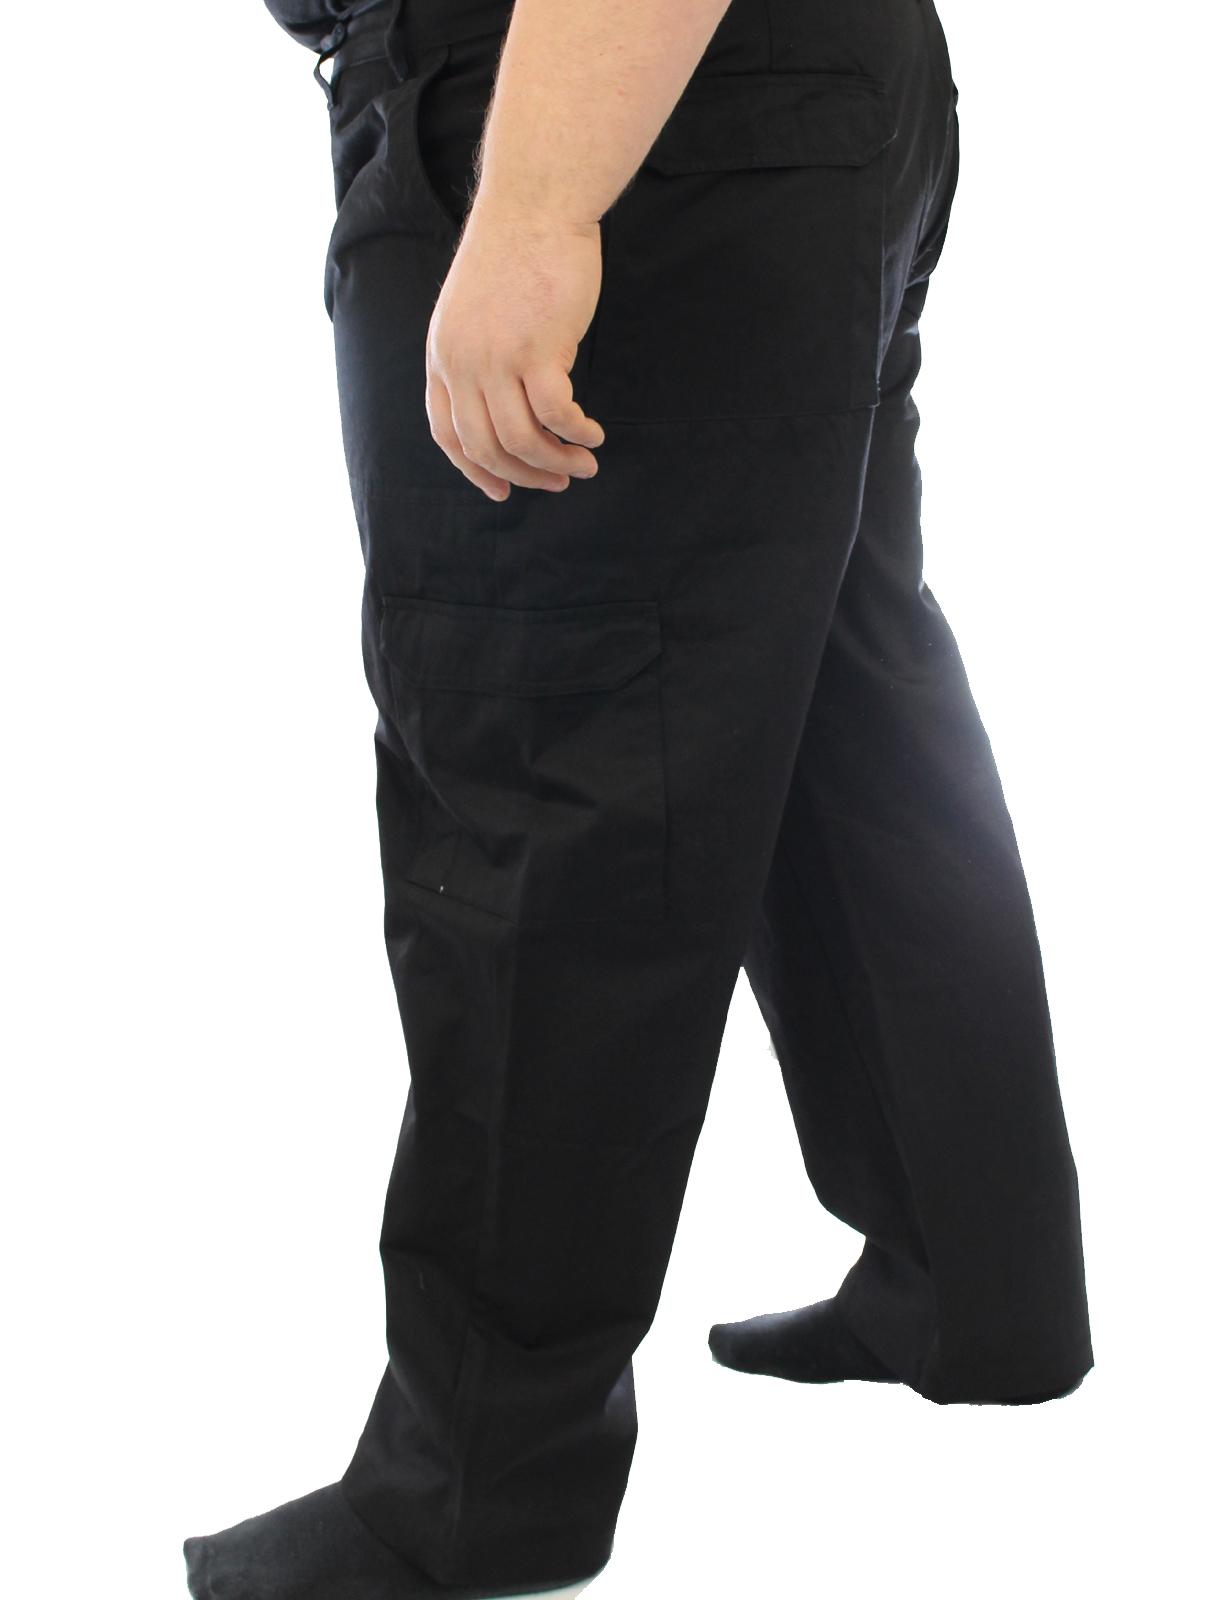 "Ed Baxter Victory - Heavy Duty Cargo Combat Trousers  - Black - 60"" Waist, 34"" Leg"